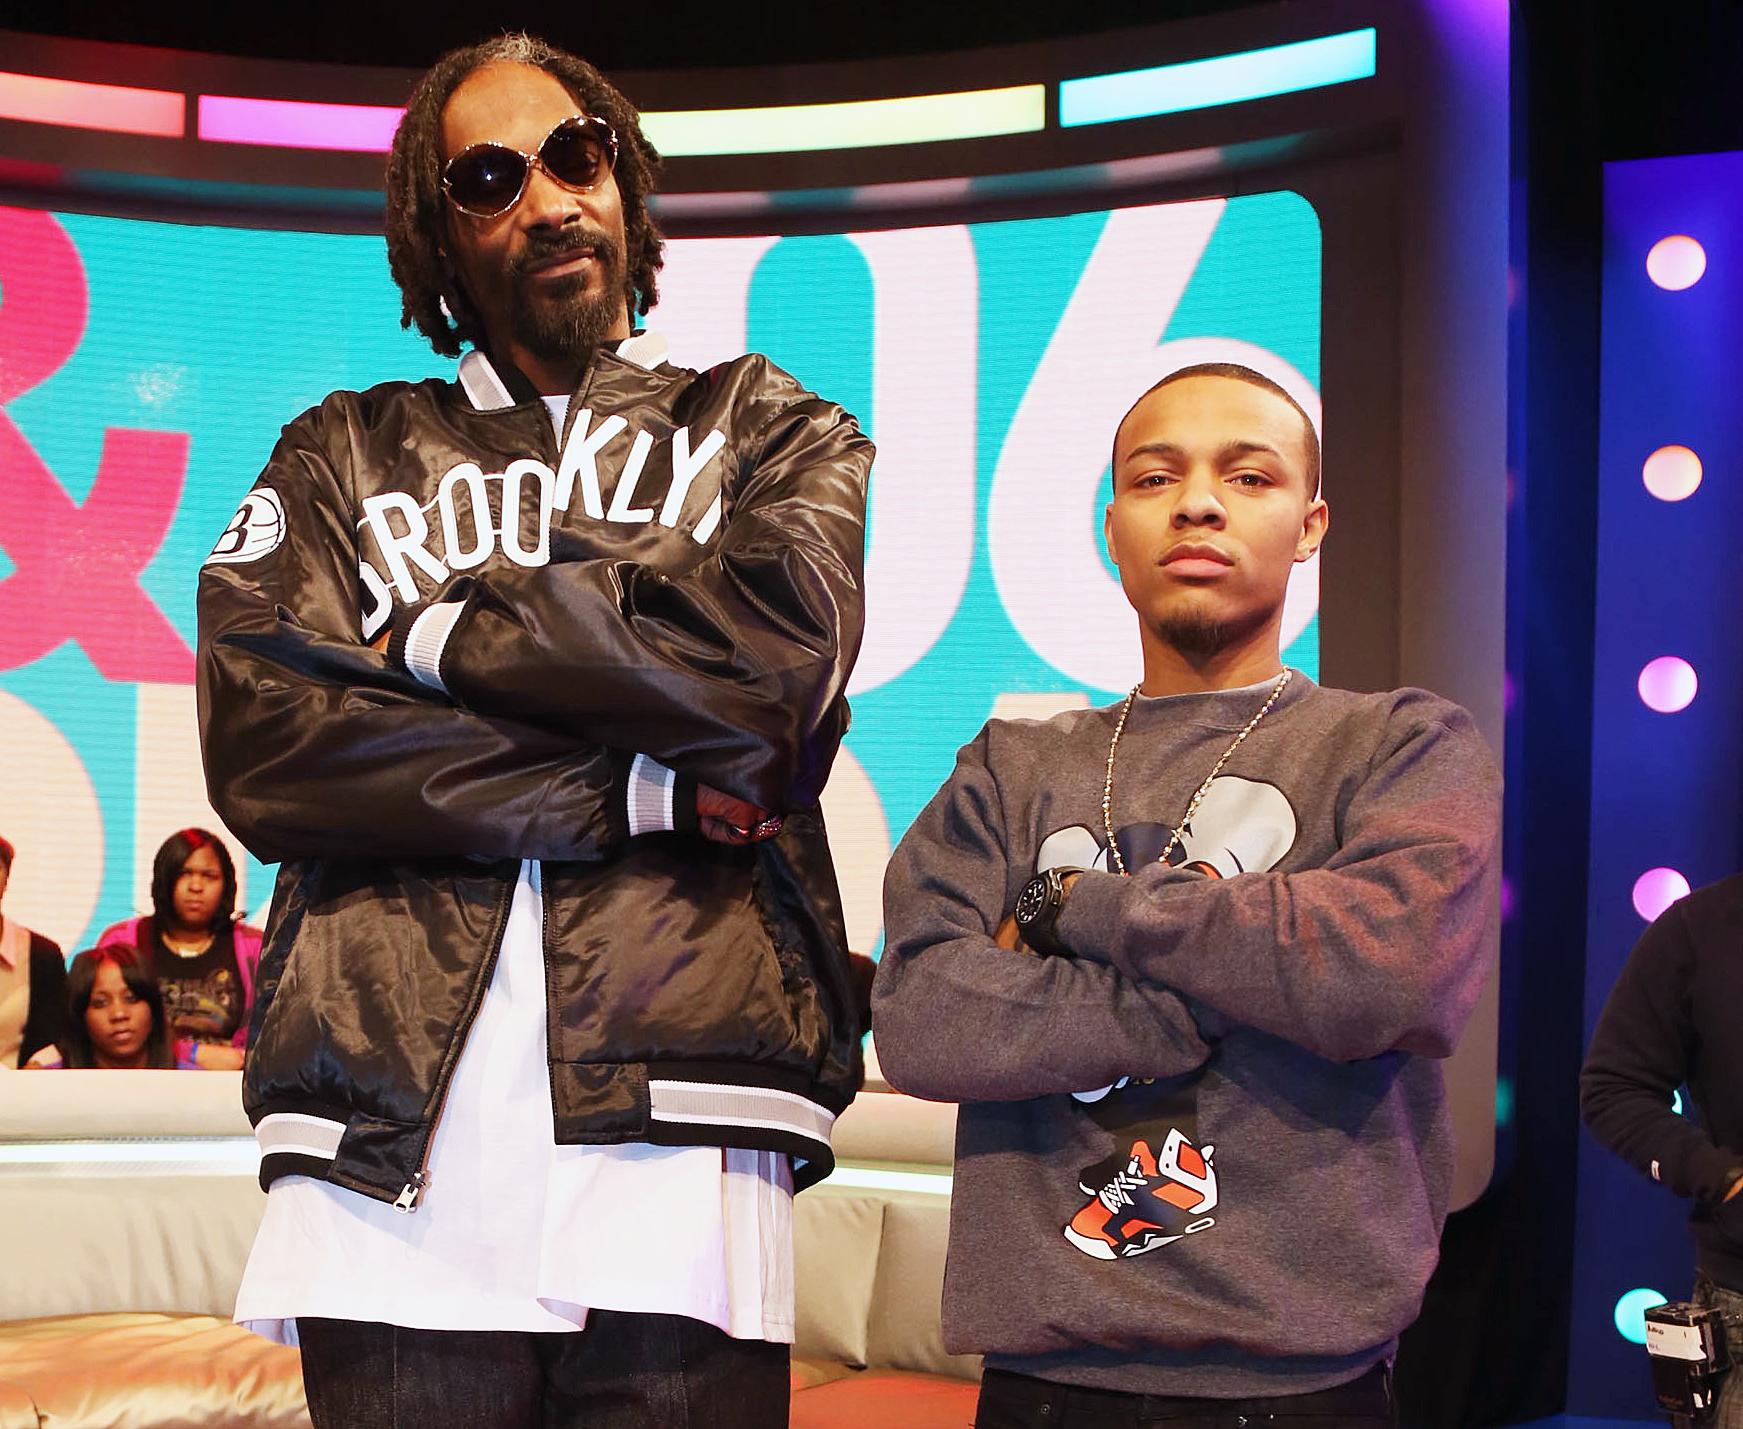 Snoop Dog Bow Wow